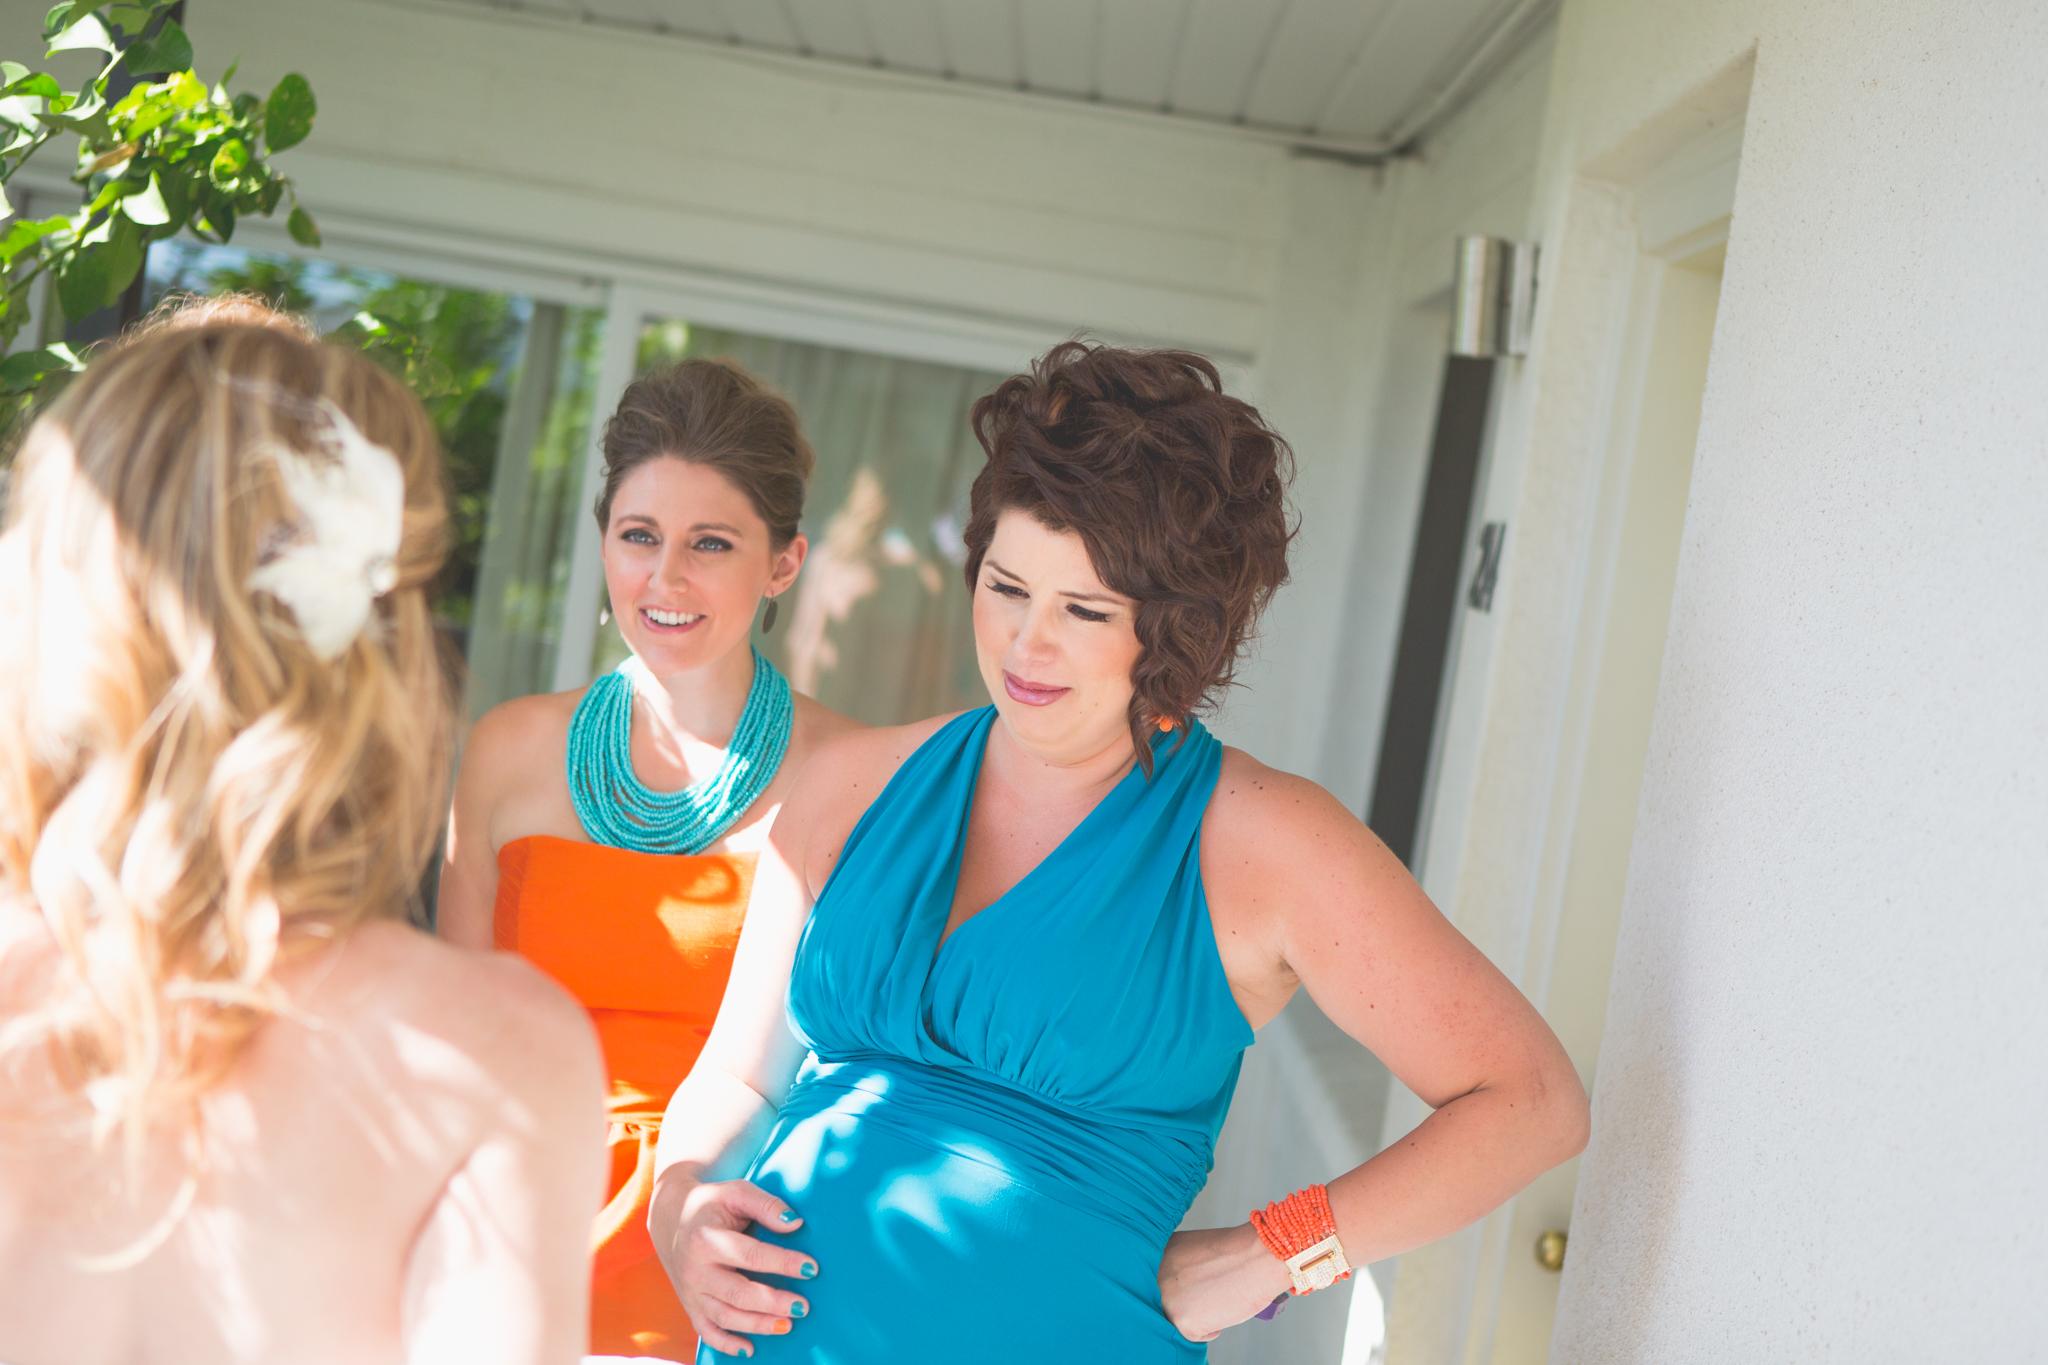 scottsdale-wedding-photographer-el-dorado-bridesmaids-look-at-dress